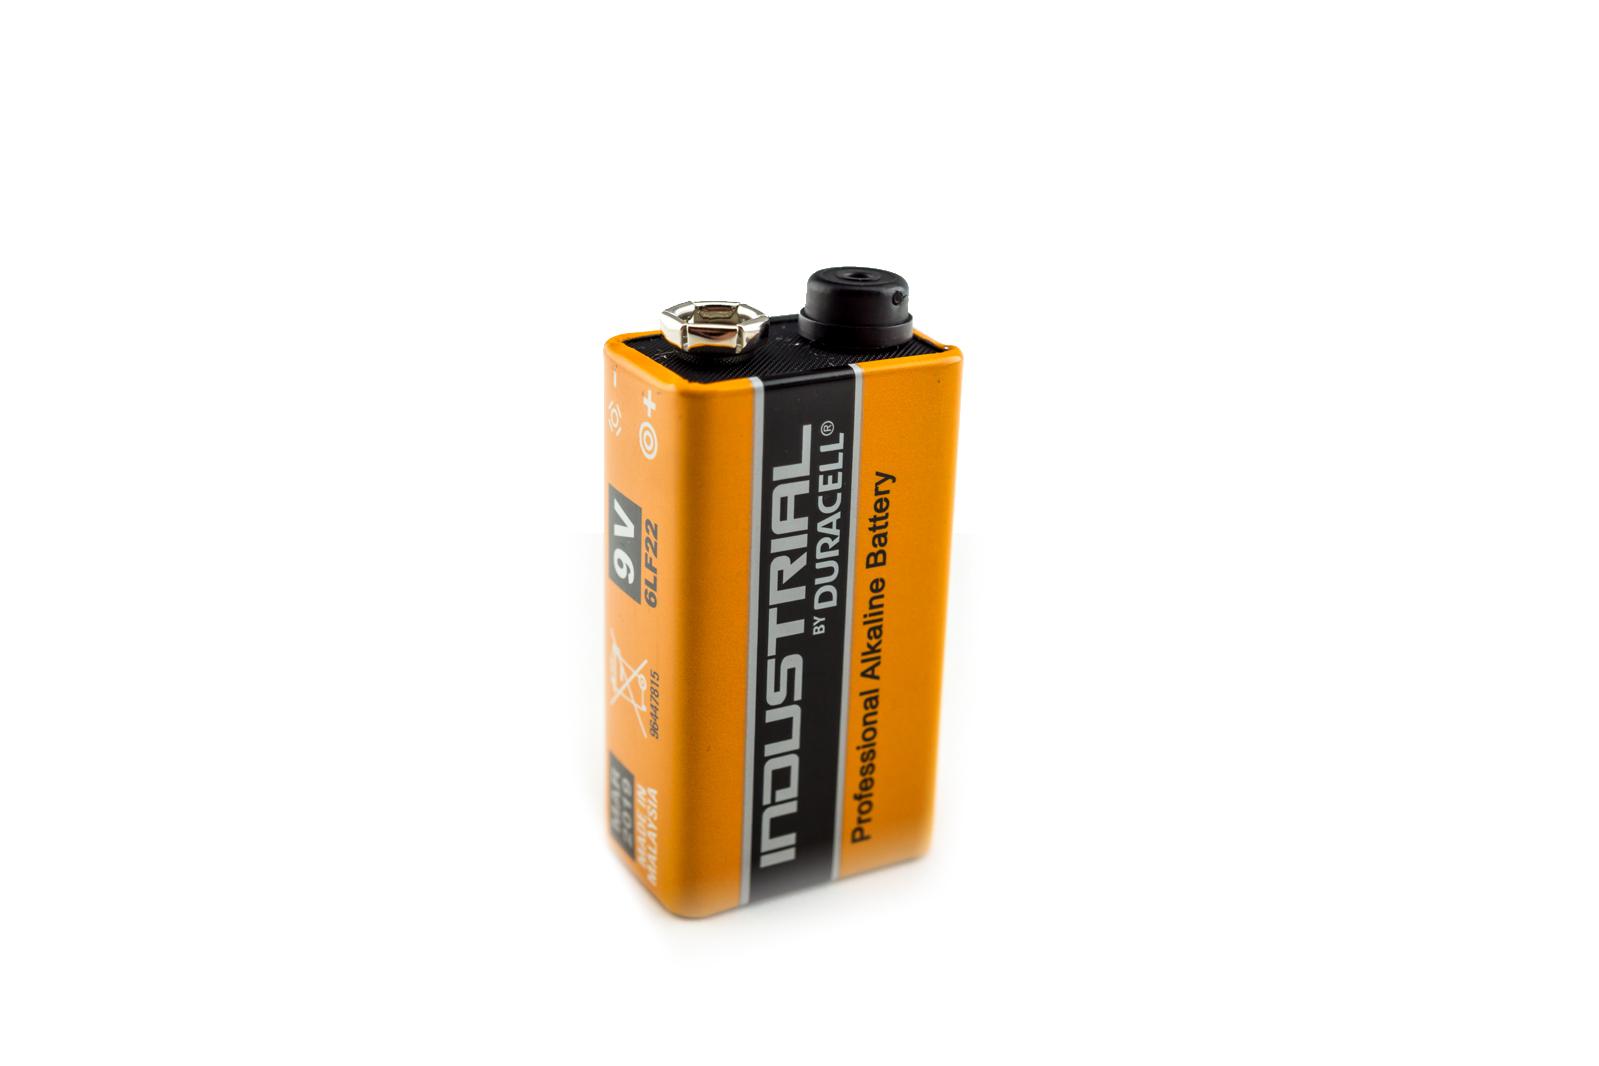 duracell industrial 9v block batterie batterien energie funksachen. Black Bedroom Furniture Sets. Home Design Ideas